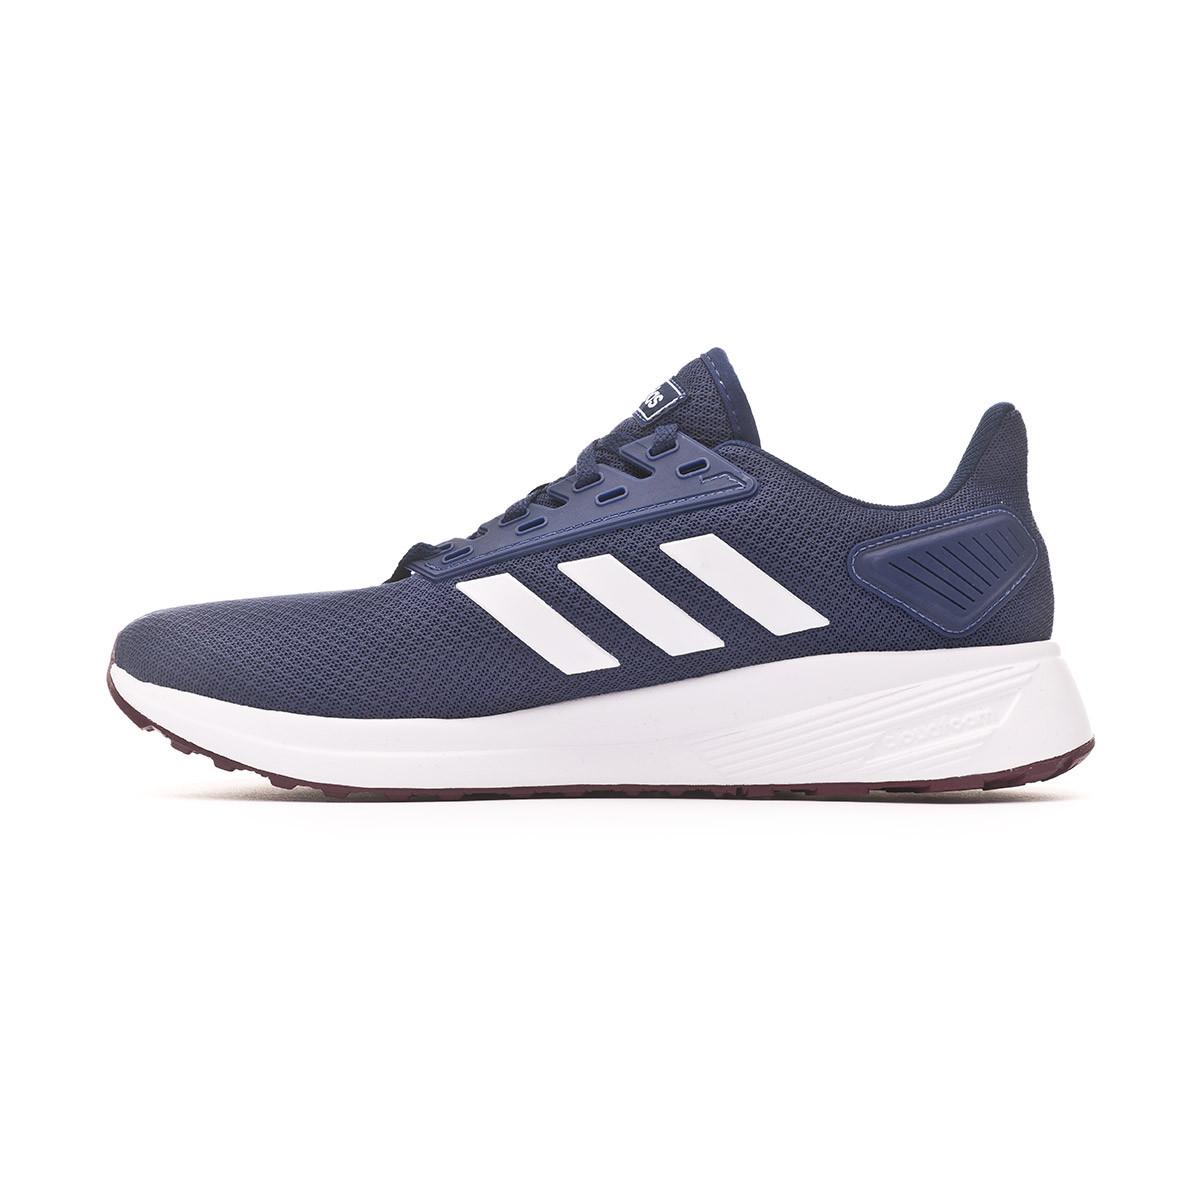 Buscar estilo Fahrenheit  Trainers adidas Duramo 9 Dark blue-White-Maroon - Football store Fútbol  Emotion